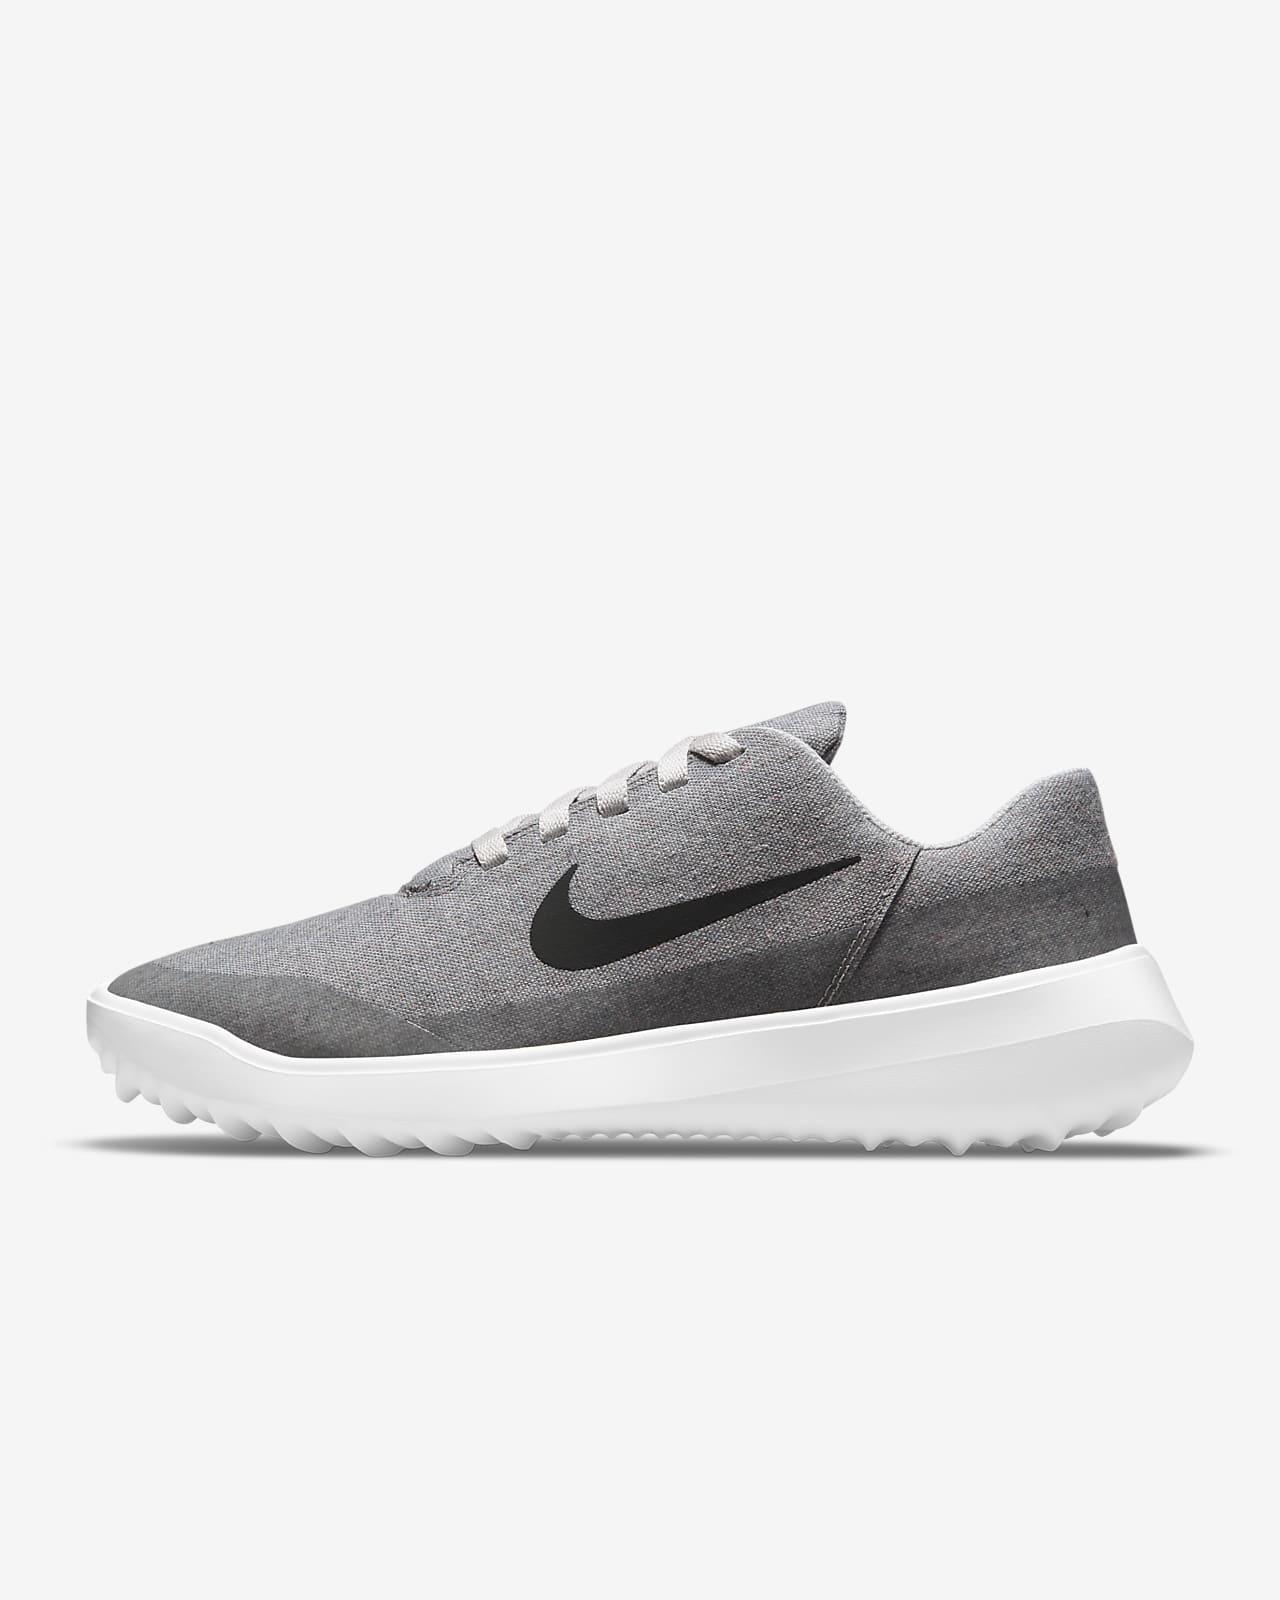 Nike Victory G Lite Golf Shoe